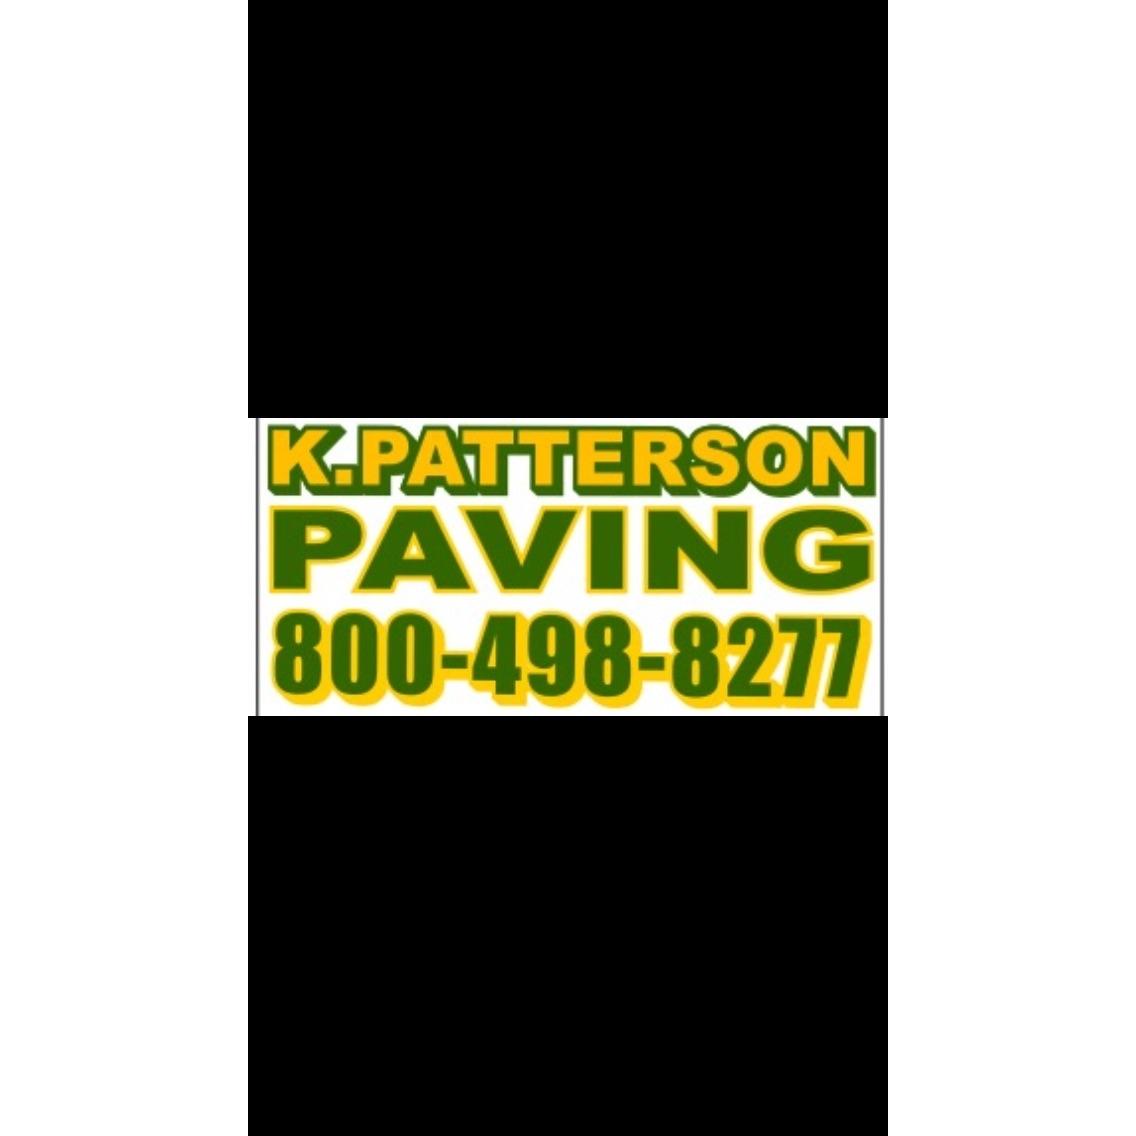 K Patterson Paving Co